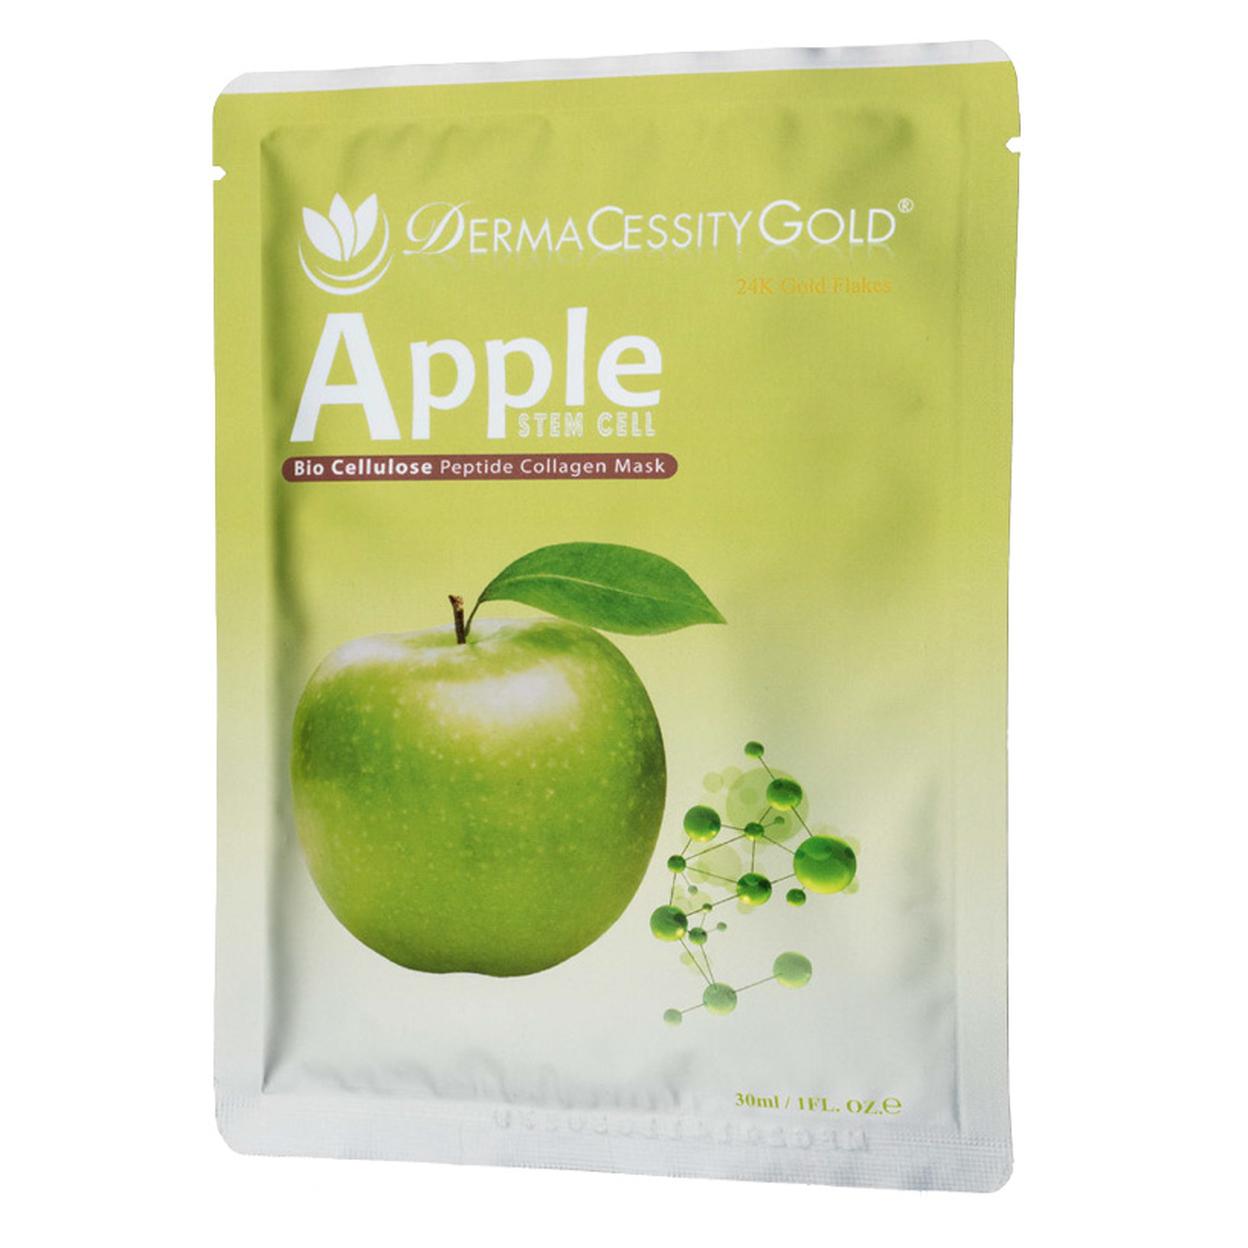 DermaCessity Gold Apple Stem Cell Collagen Peptide Mask (1 oz) 563ffebea3771cb83e8ba4f8